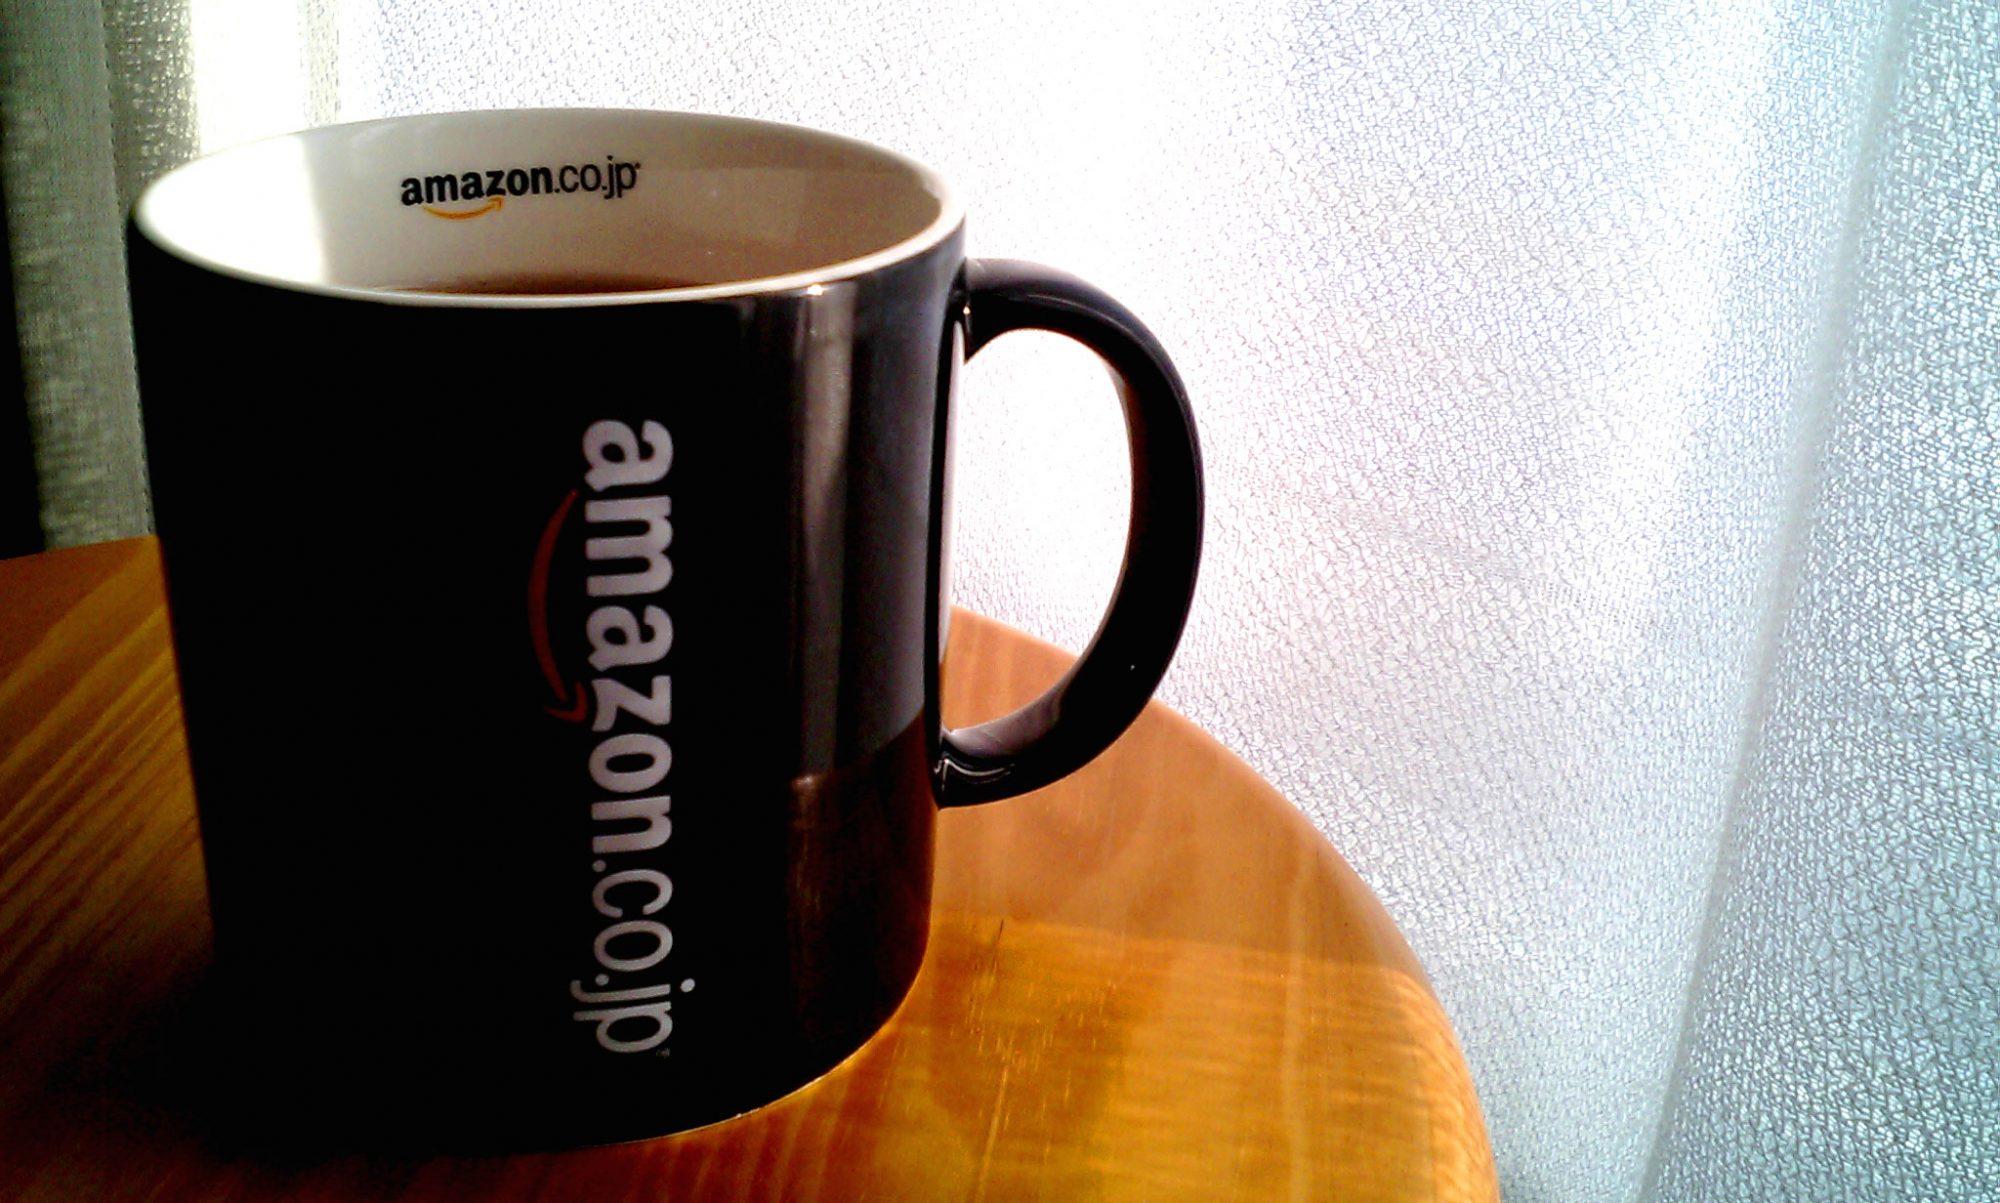 EC: Amazon Alexa Will Now Make Your Coffee, Too